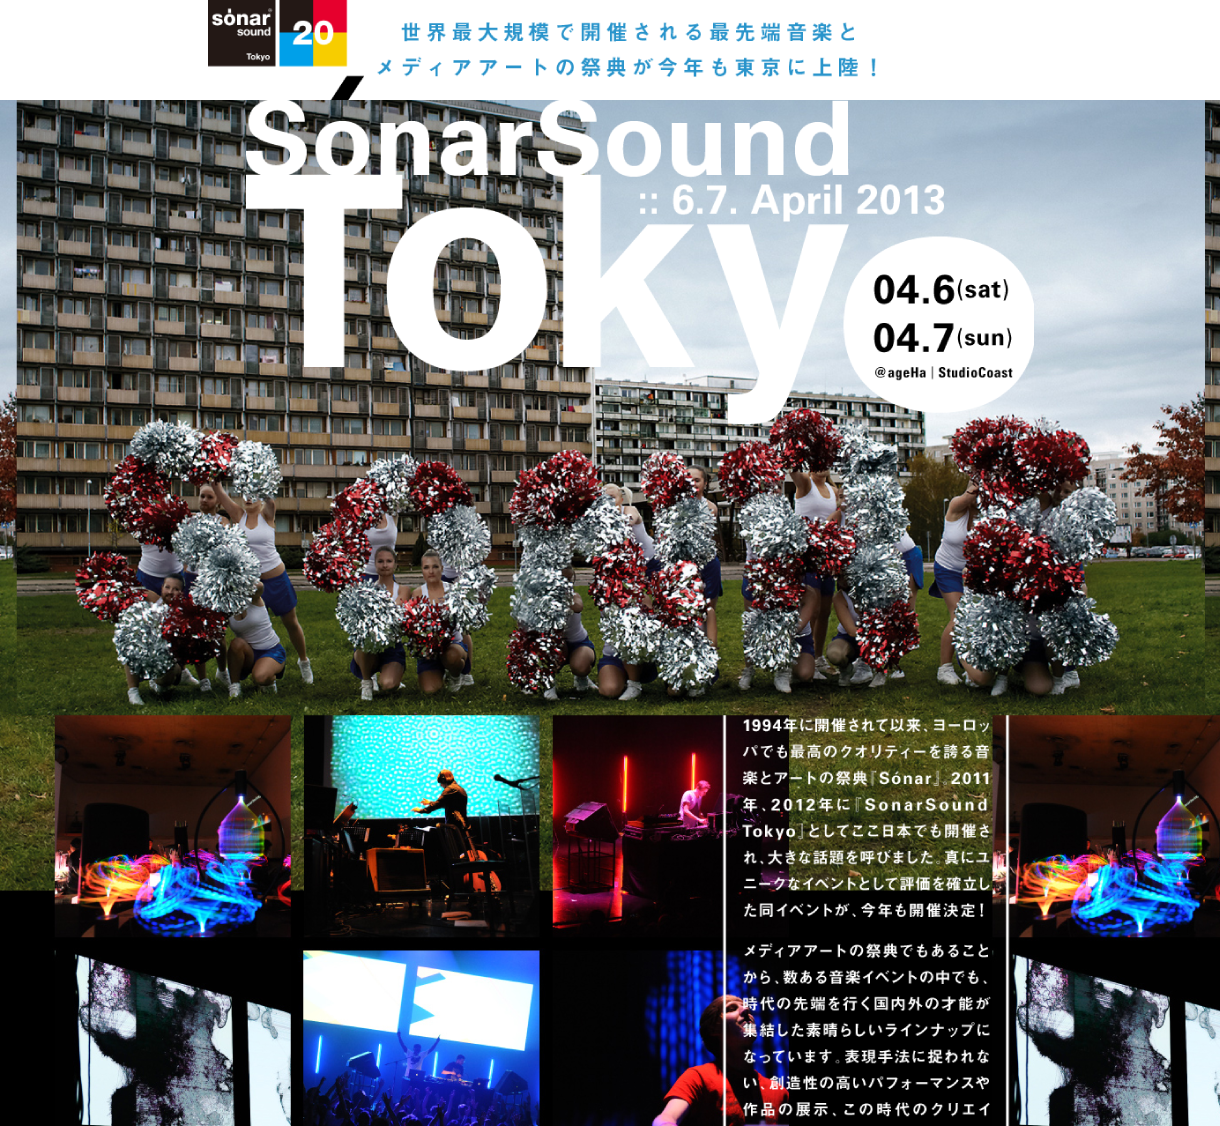 SonarSoundTokyo 2013 プロモーション